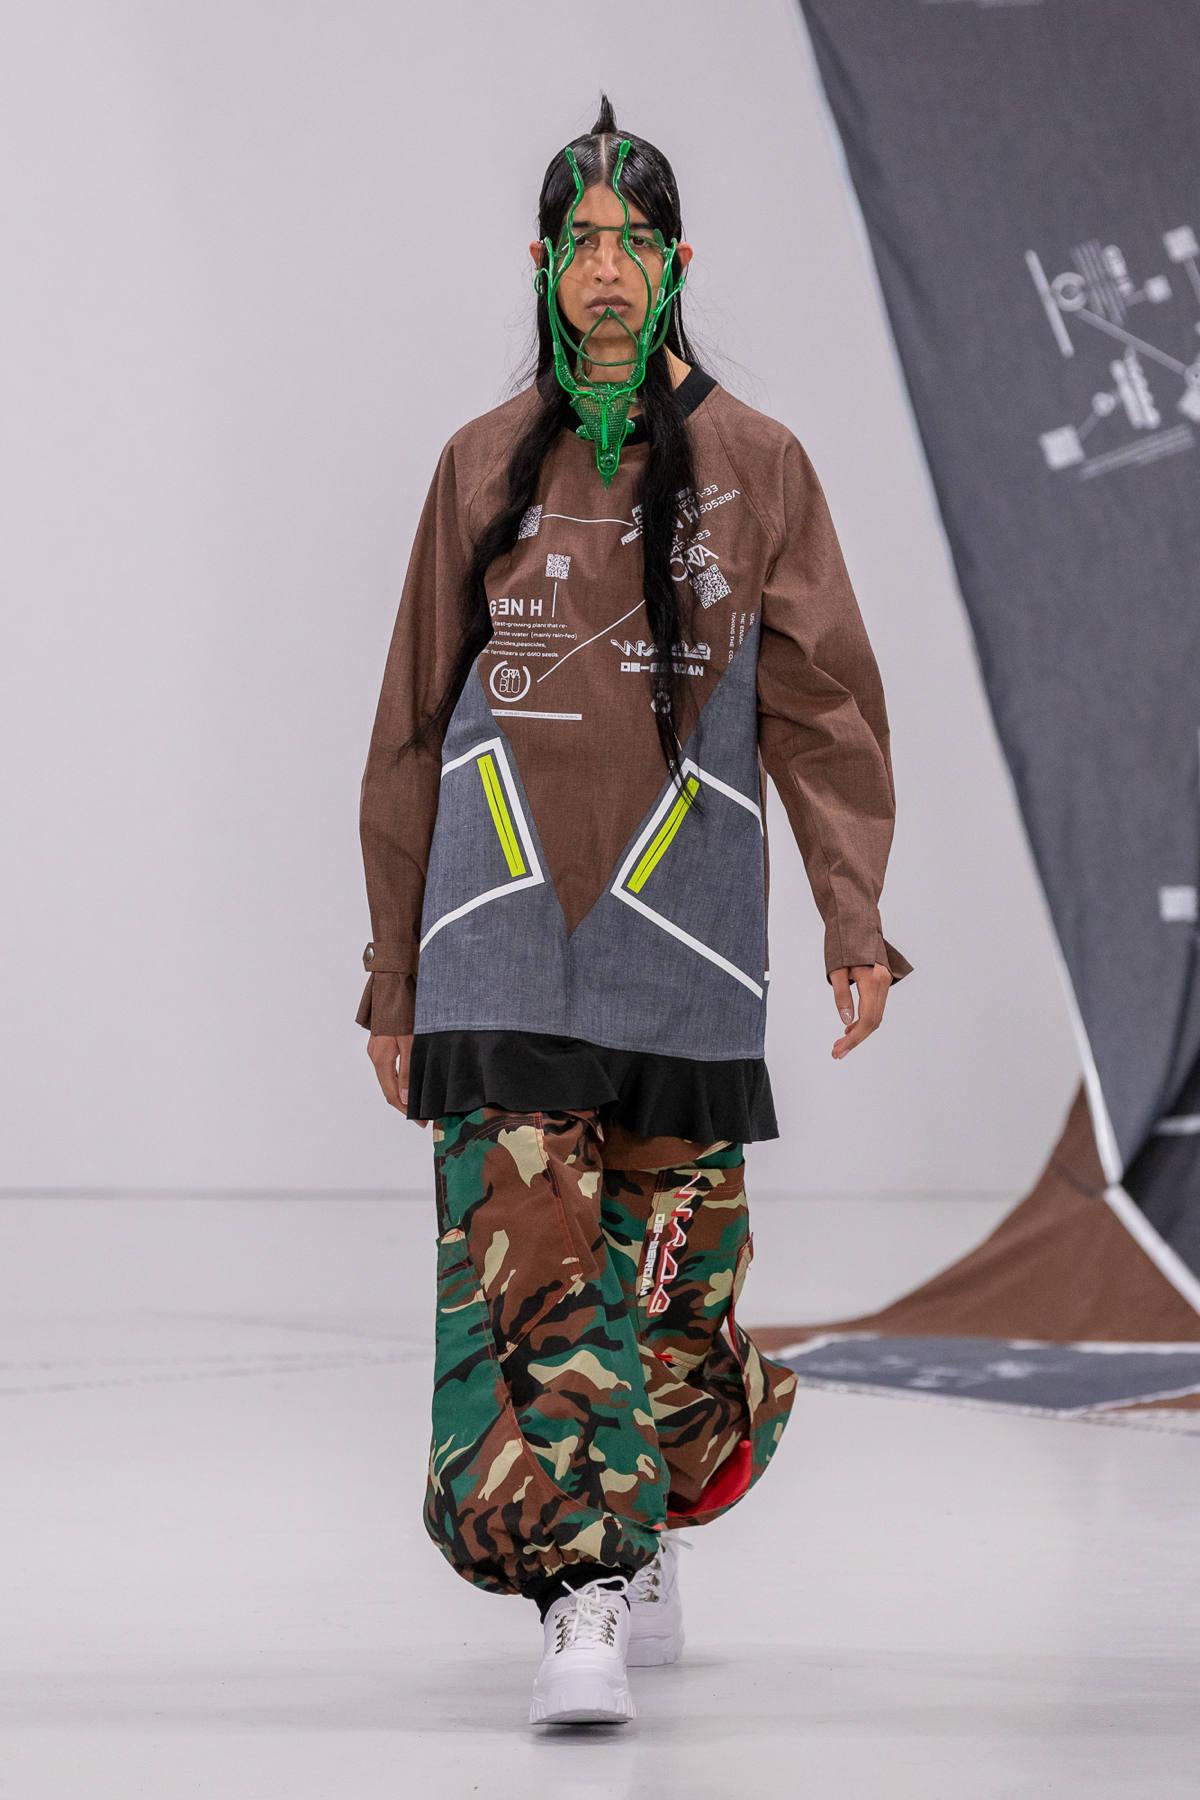 London Fashion Week Autumn Winter 2020 - DB Berdan